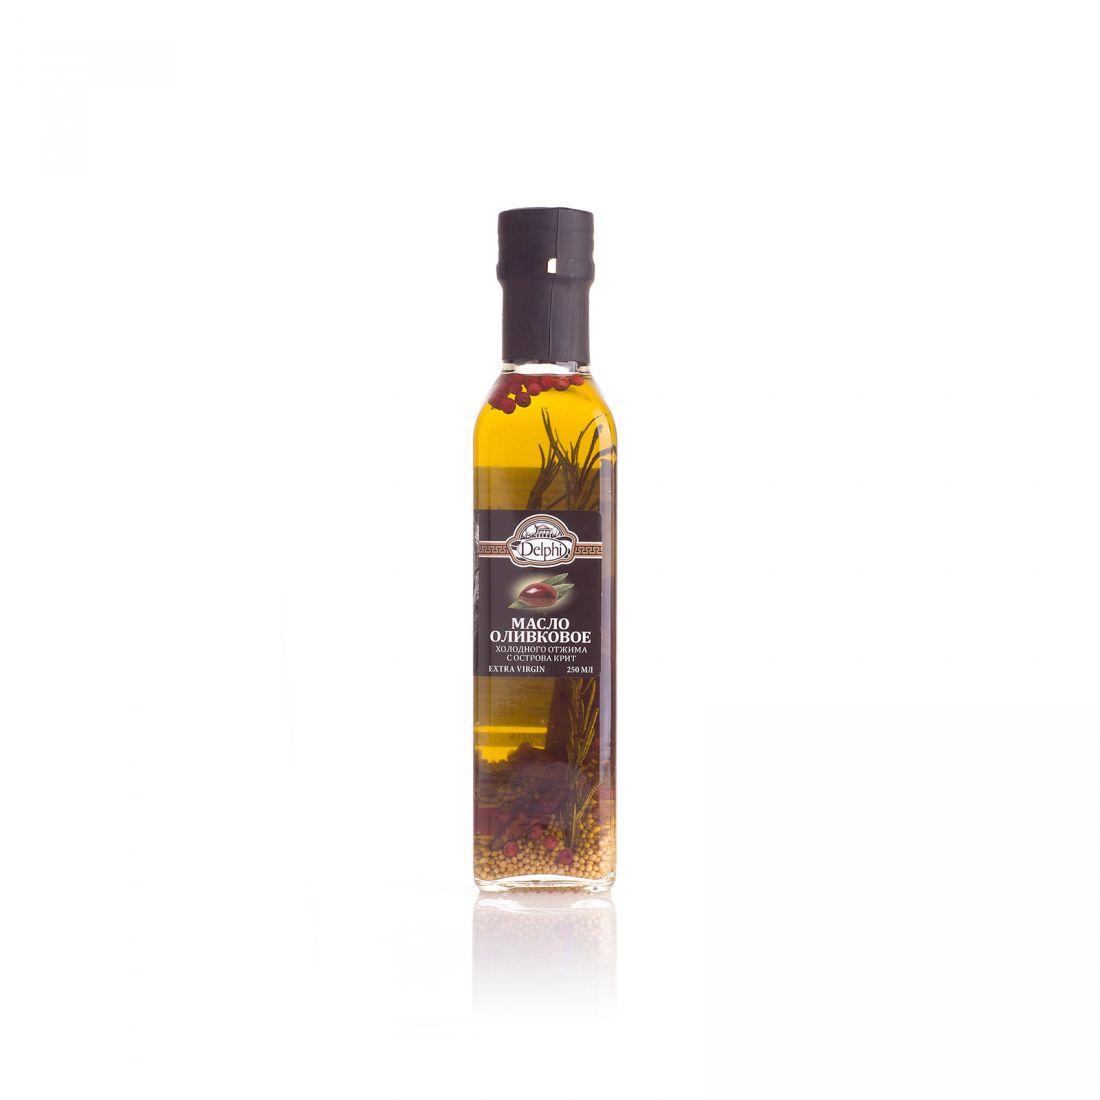 Оливковое масло с травами DELPHI  - 250 мл экстра вирджин